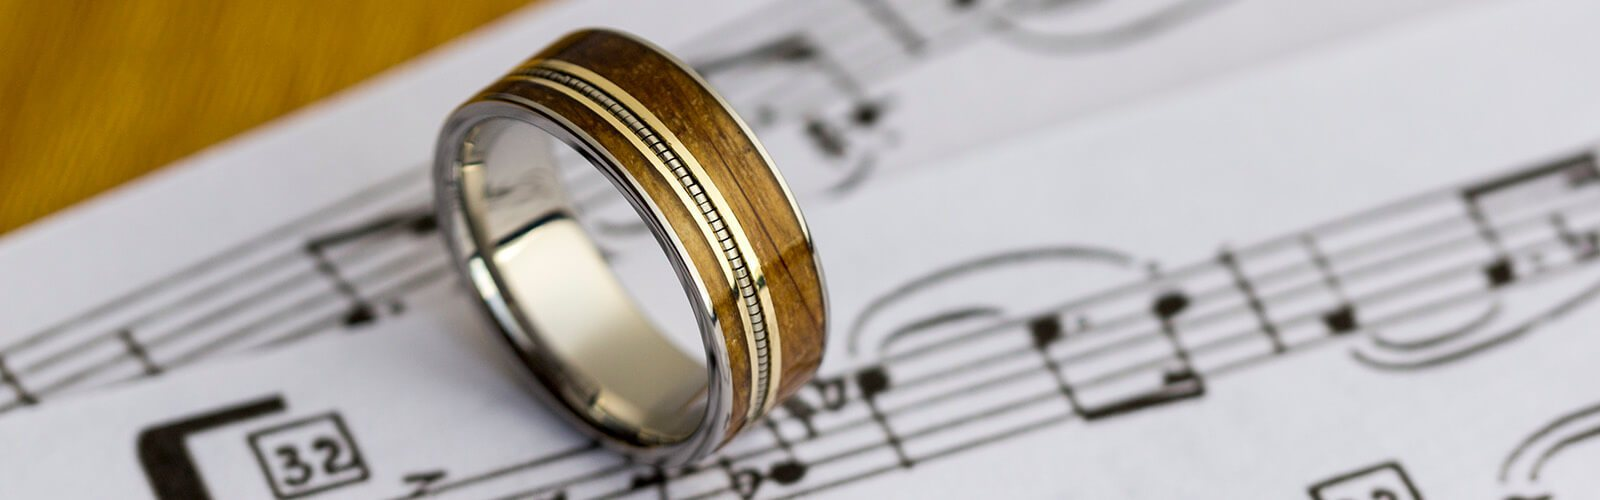 rings-for-musicians-collection-2048x-1da3fdf3-191a-413e-b92f-bb979830f78d-2048x.jpg